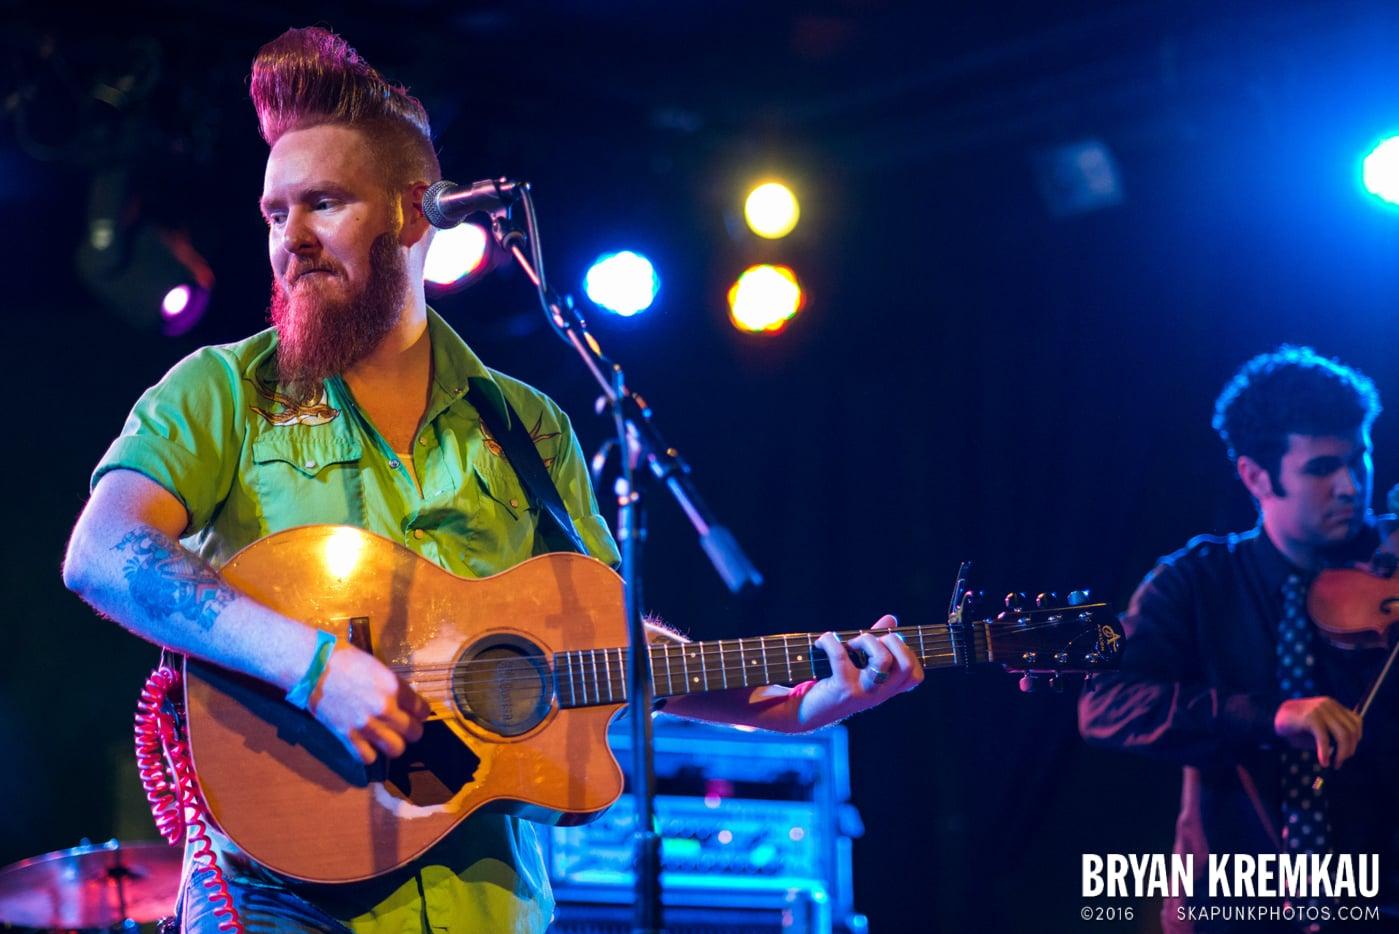 Danny Burns Band @ Knitting Factory, Brooklyn, NY - 9.10.14 (10)